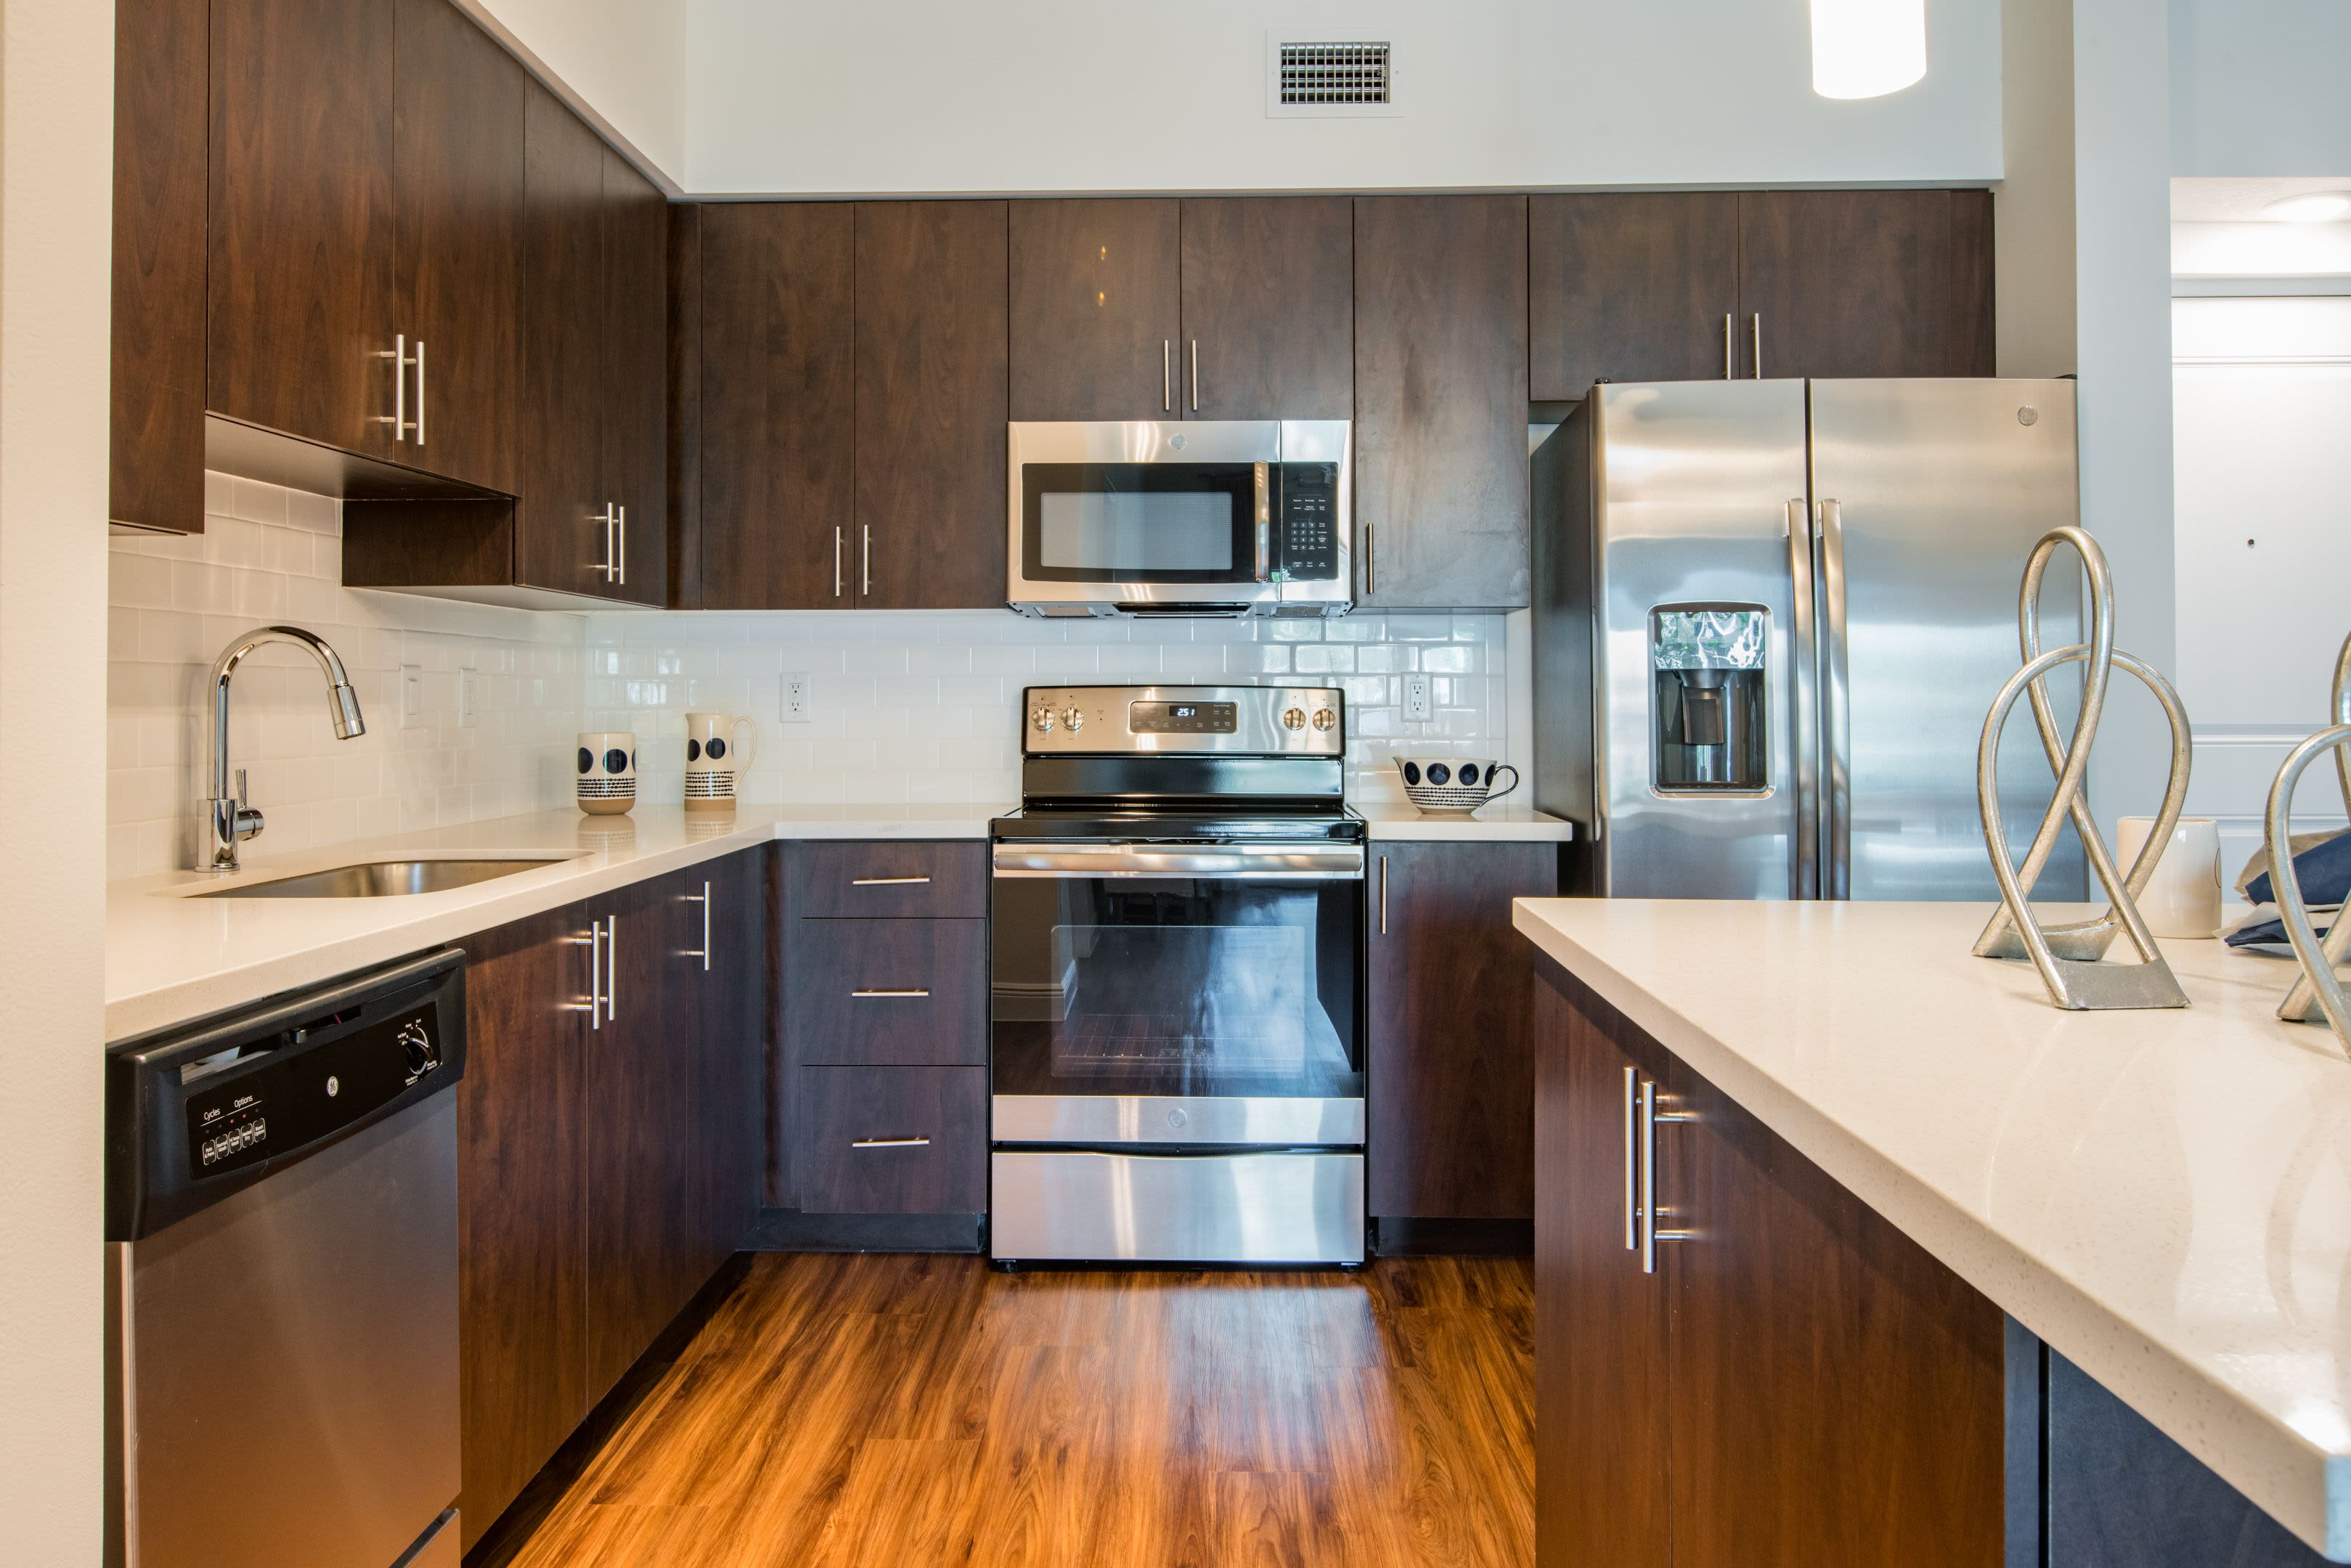 Modern Kitchen at Luma Miramar Apartments in Miramar, Florida